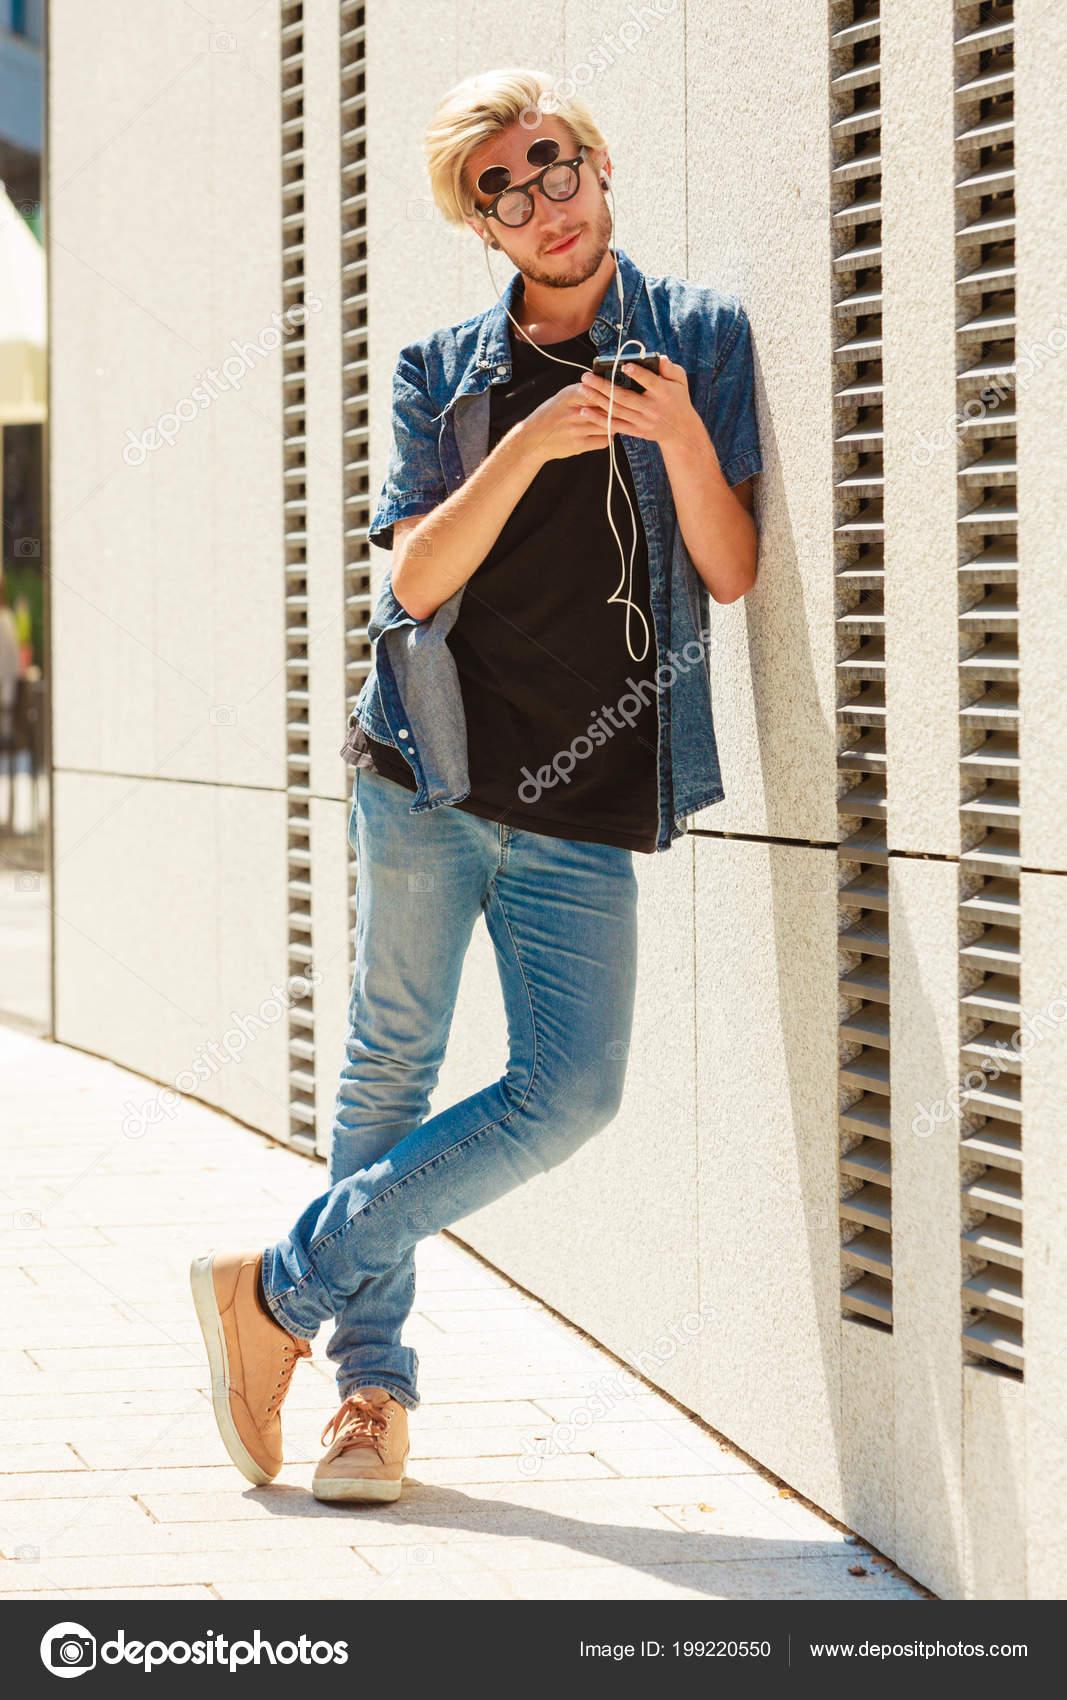 Men Fashion Technology Urban Style Clothing Concept Hipster Guy Standing Stock Photo C Anetlanda 199220550